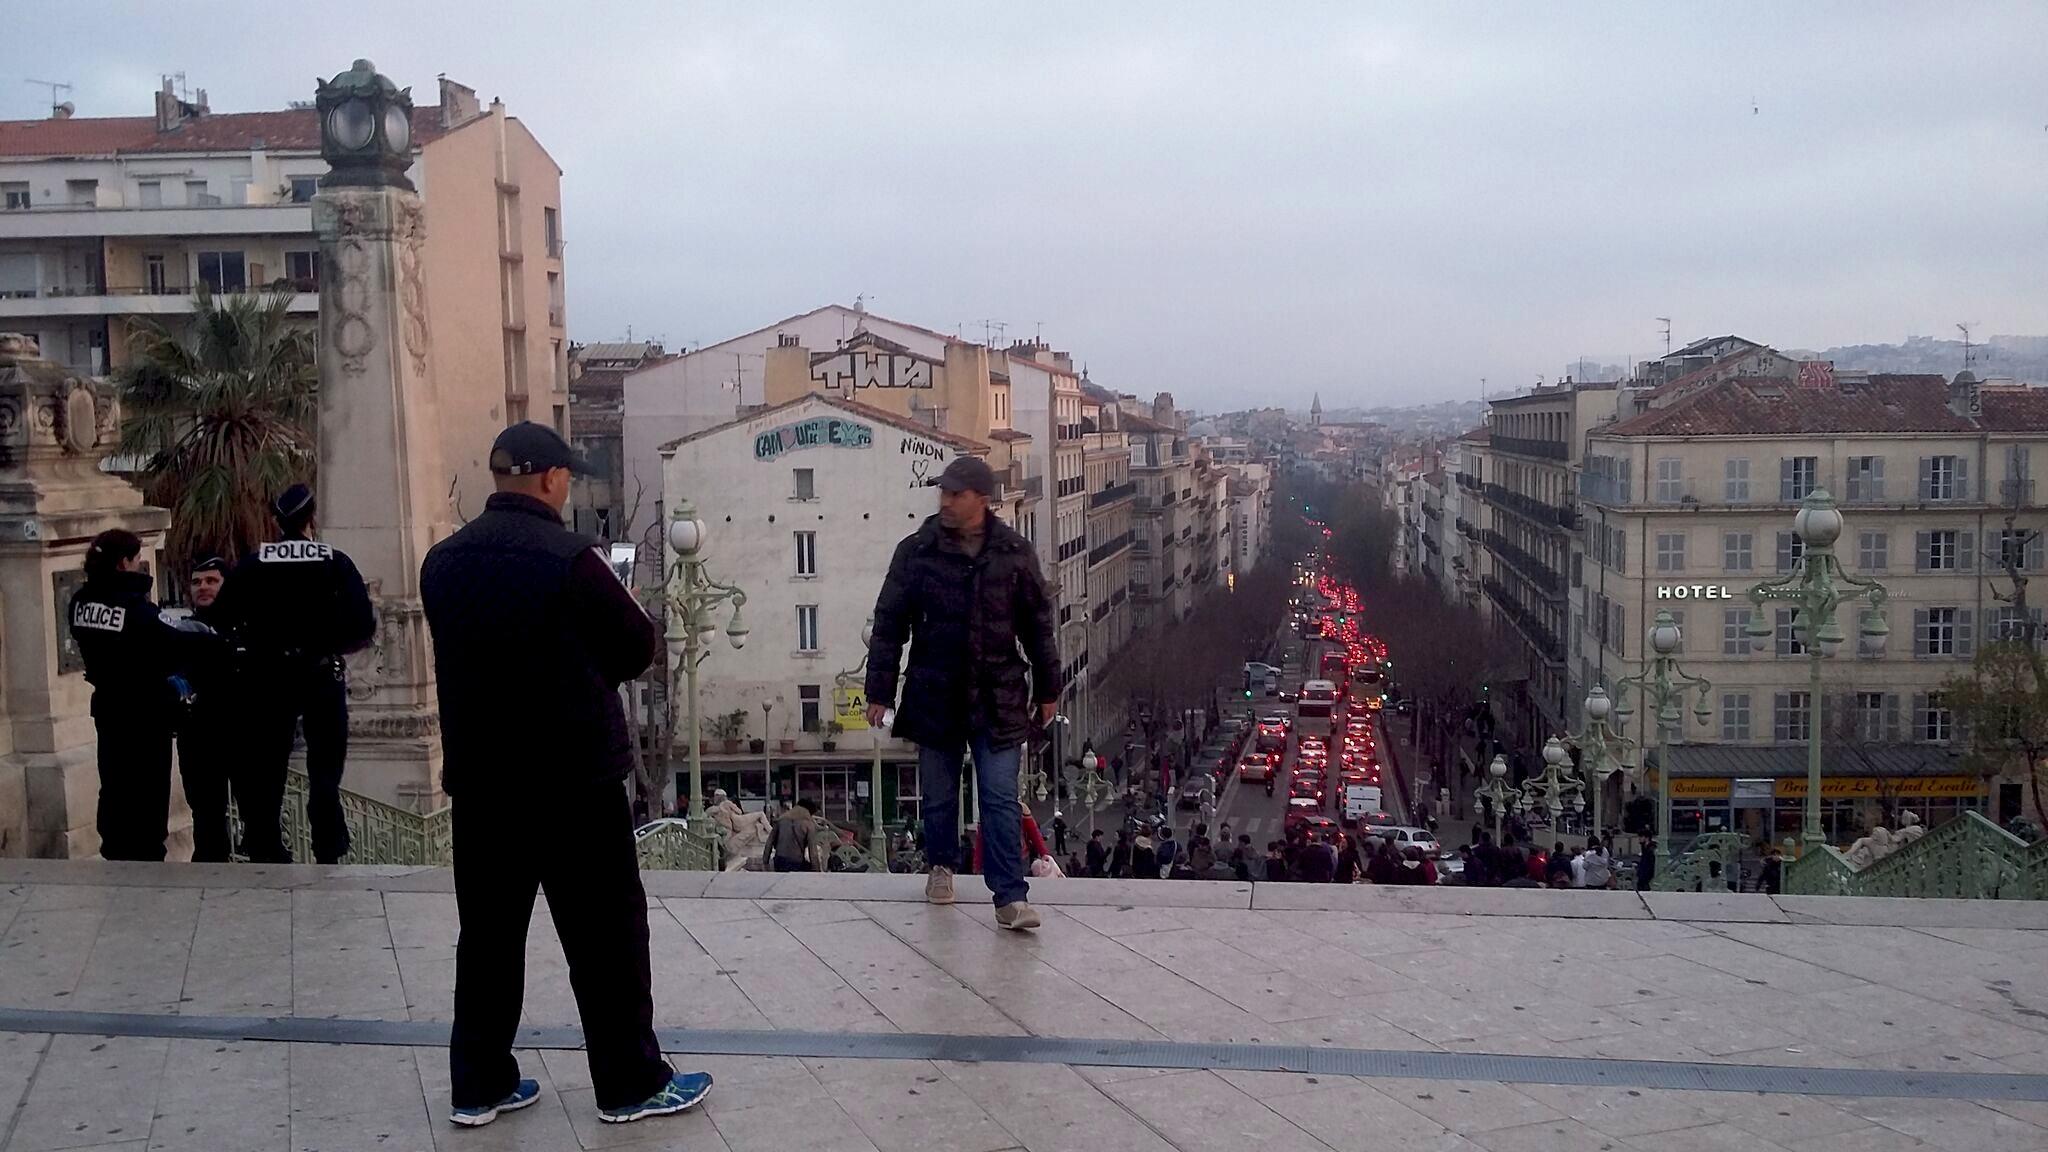 Rassemblement Marche Marseille 17/03/2017